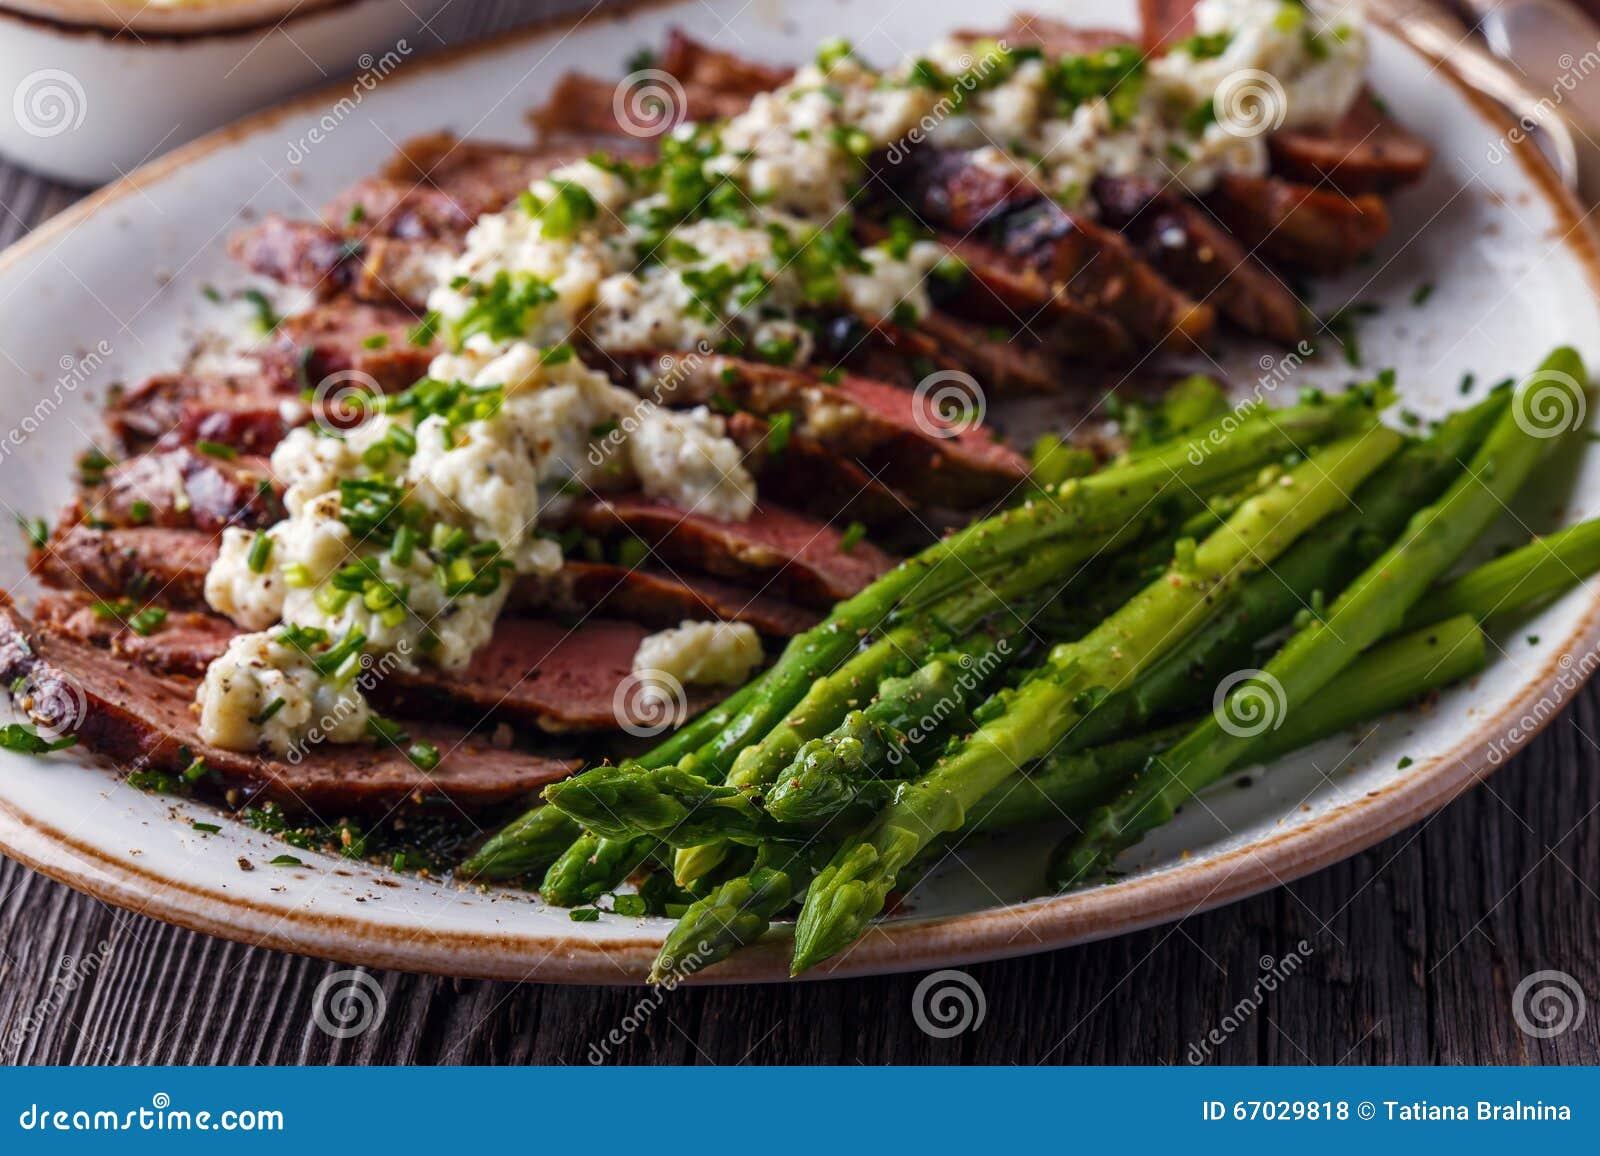 Asparagus Background Blue Cheese Sauce Steak